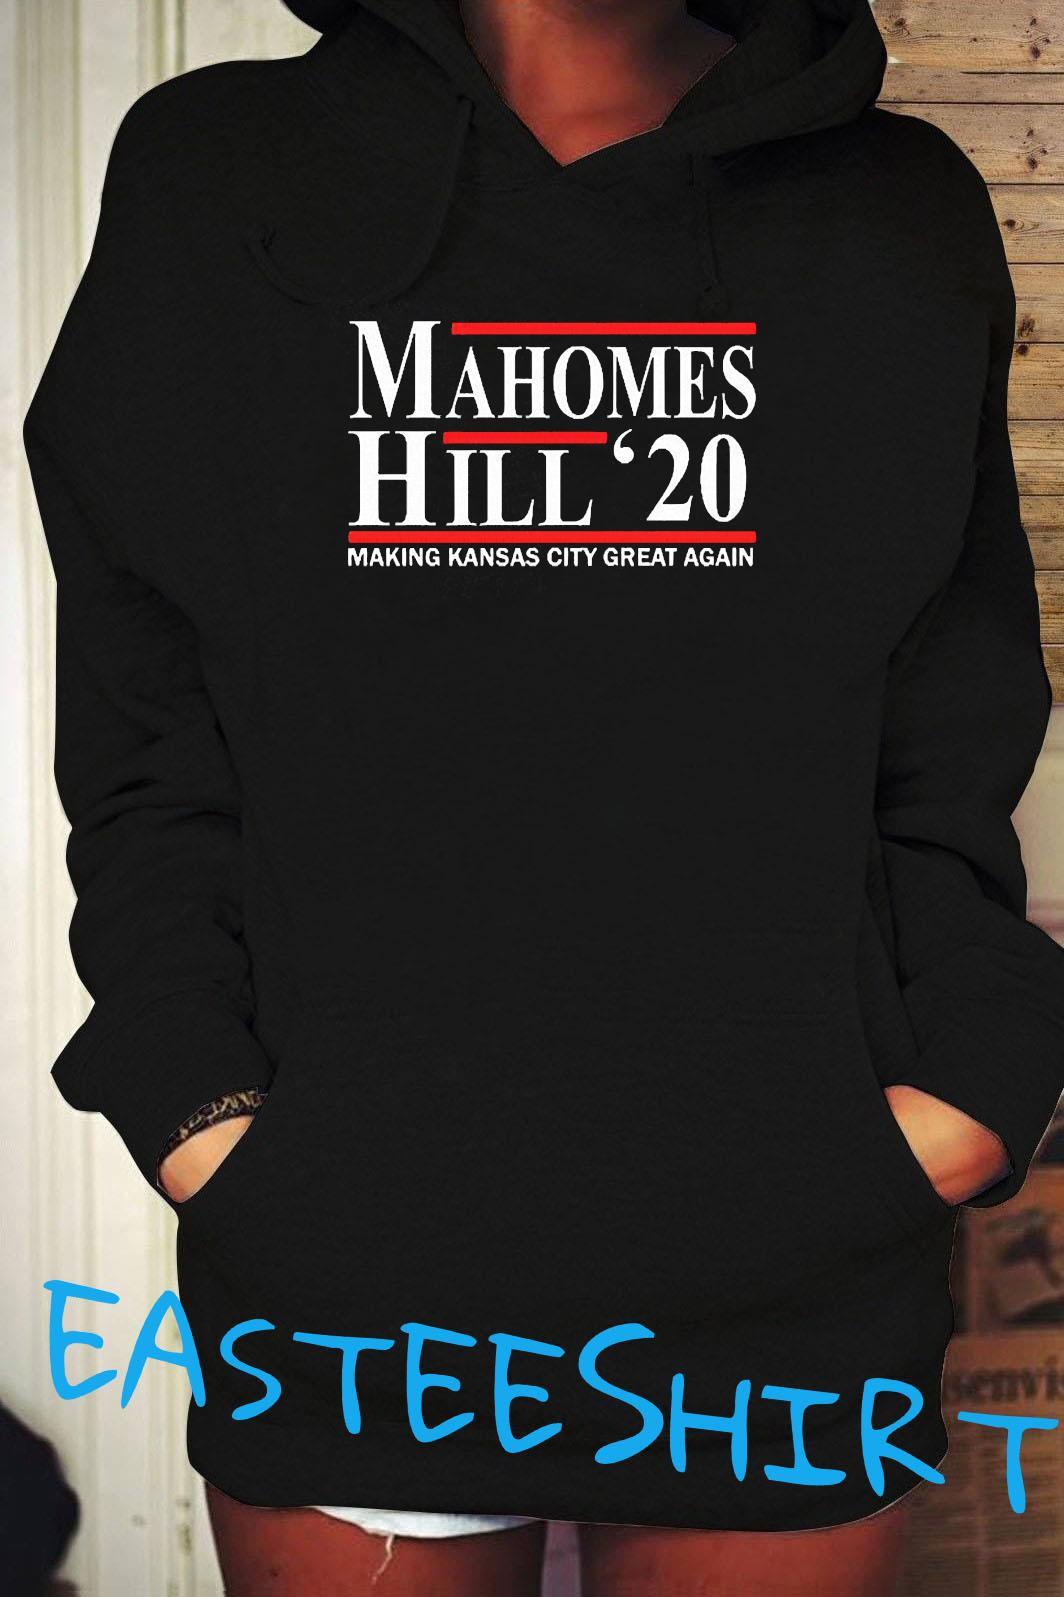 Mahomes Hill 2020 Make Kansas City Great Again Shirt Hoodie